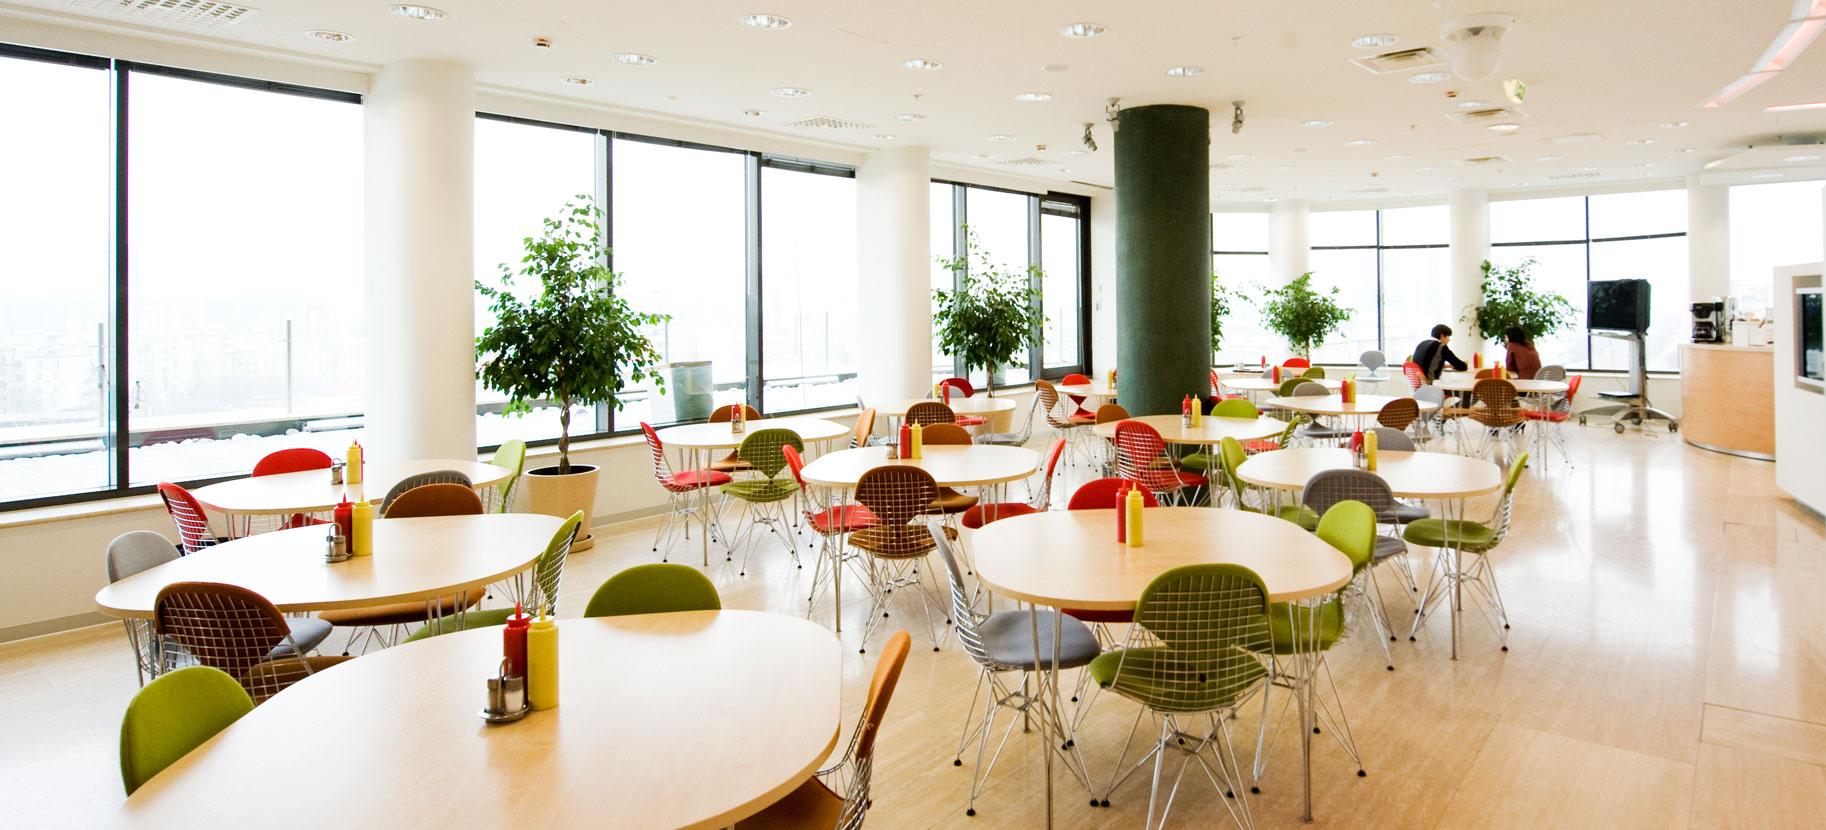 pwc-cafeteria